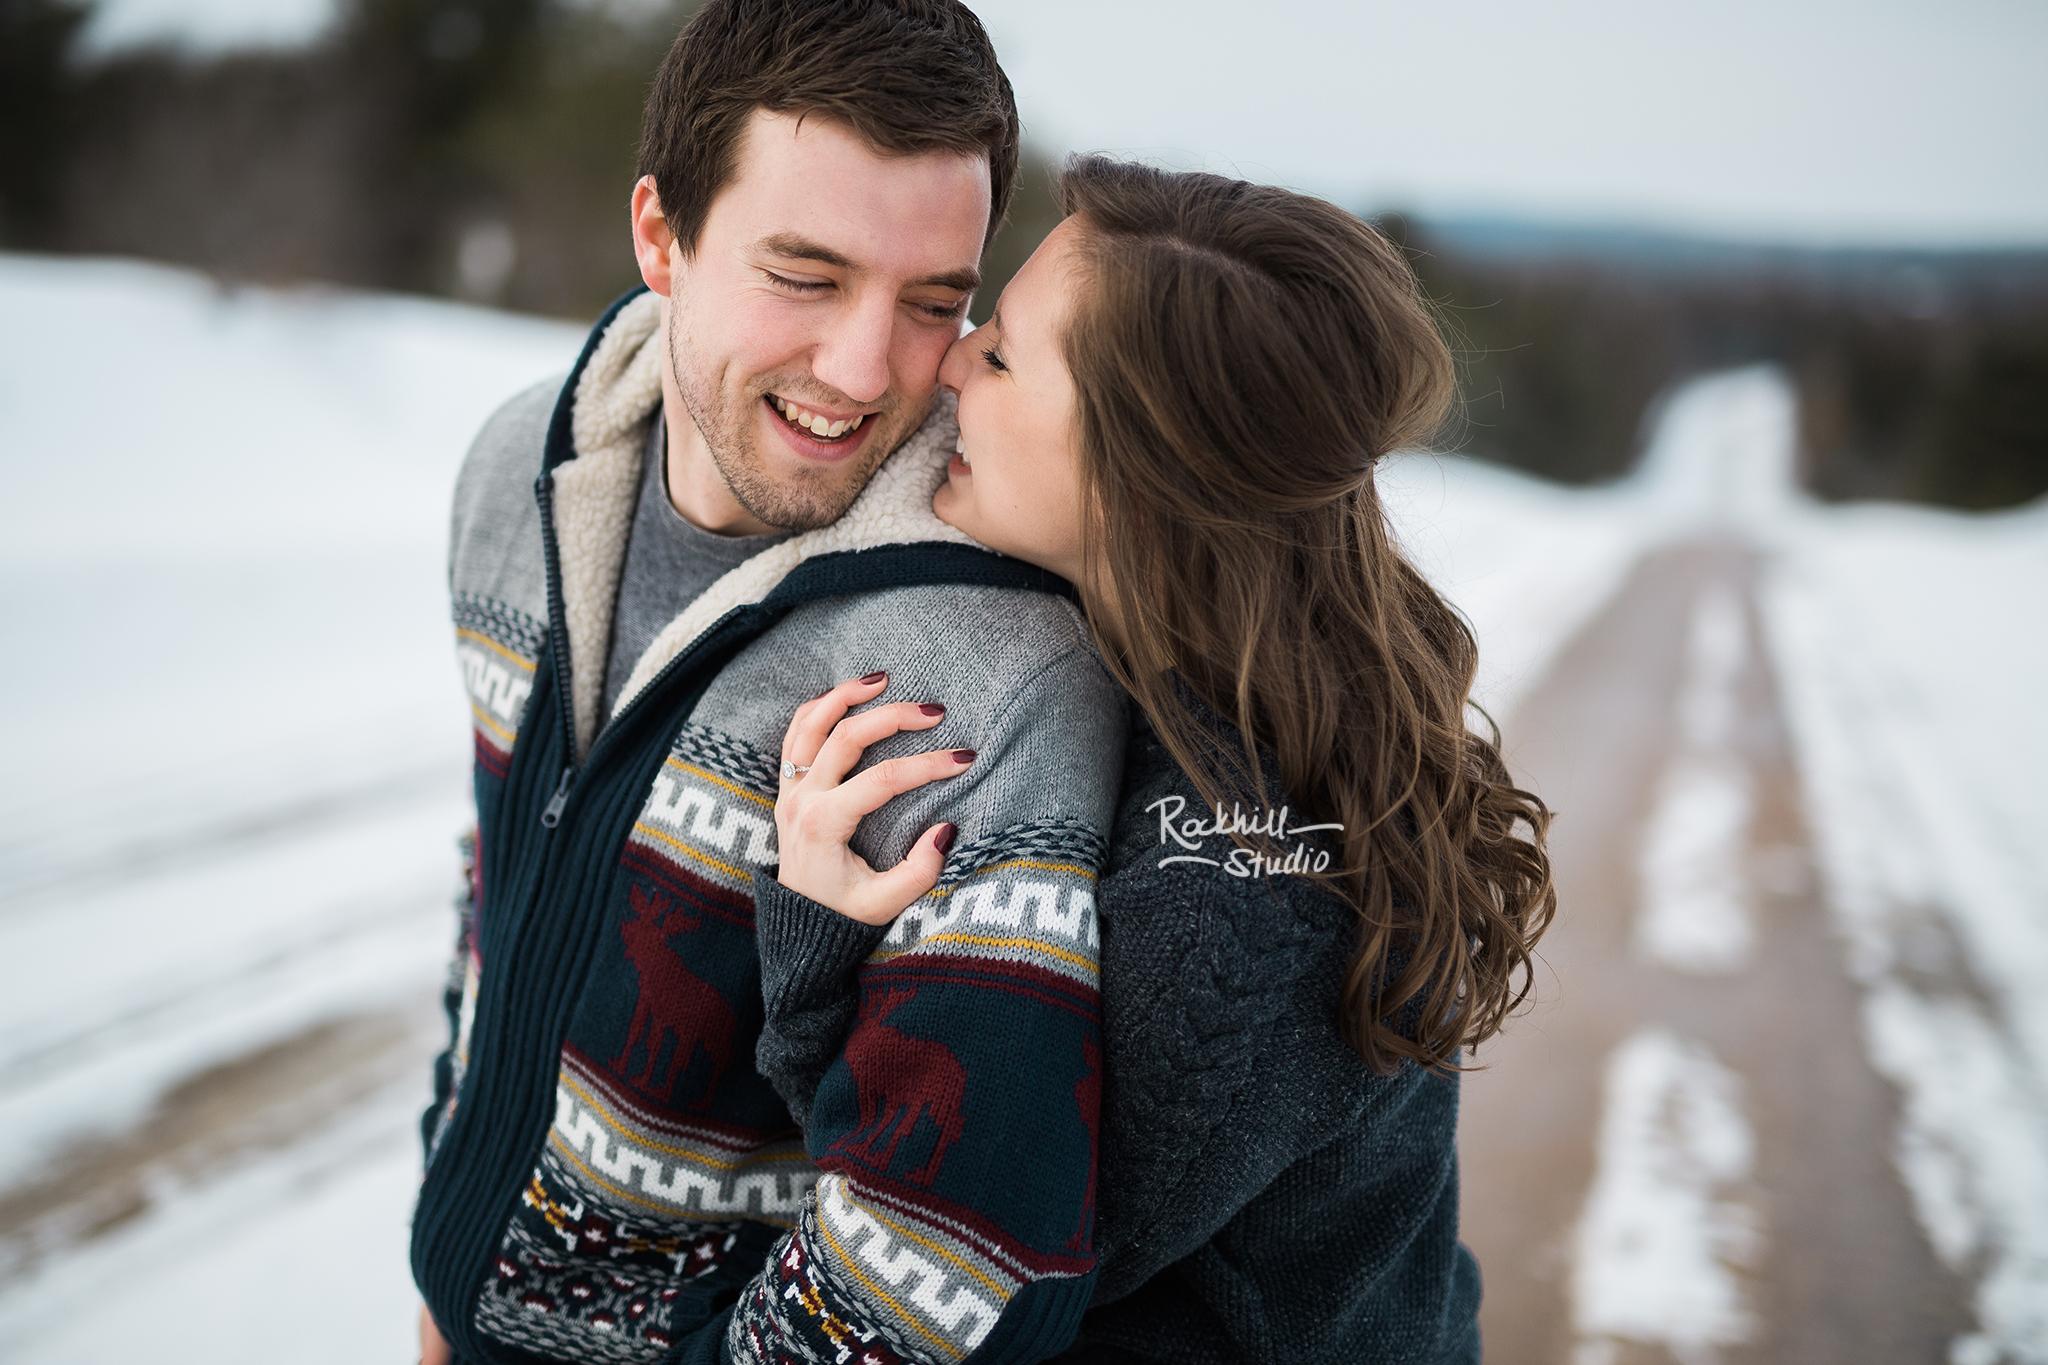 northern-michigan-wedding-photography-rockhill-studio-winter-engagement-1.jpg